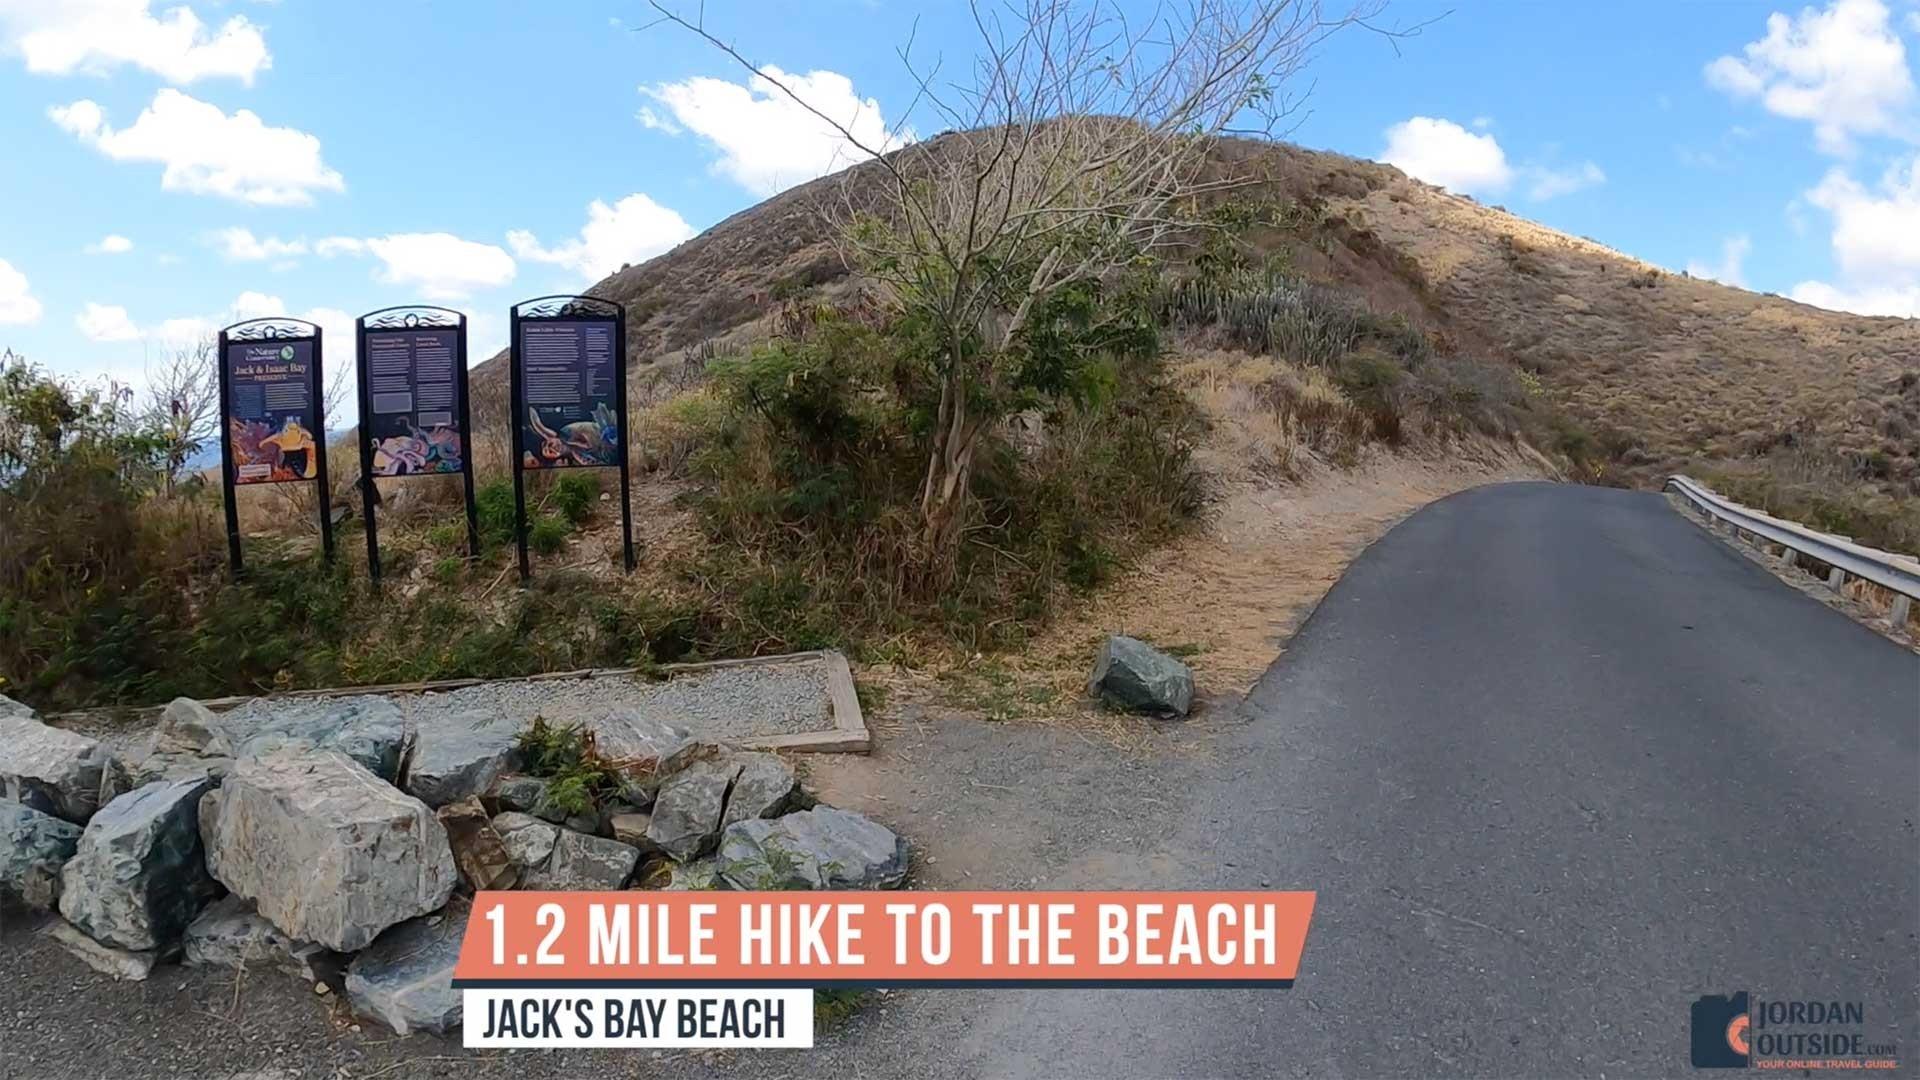 1.2 Mile Hike to Jack's Bay Beach, St. Croix